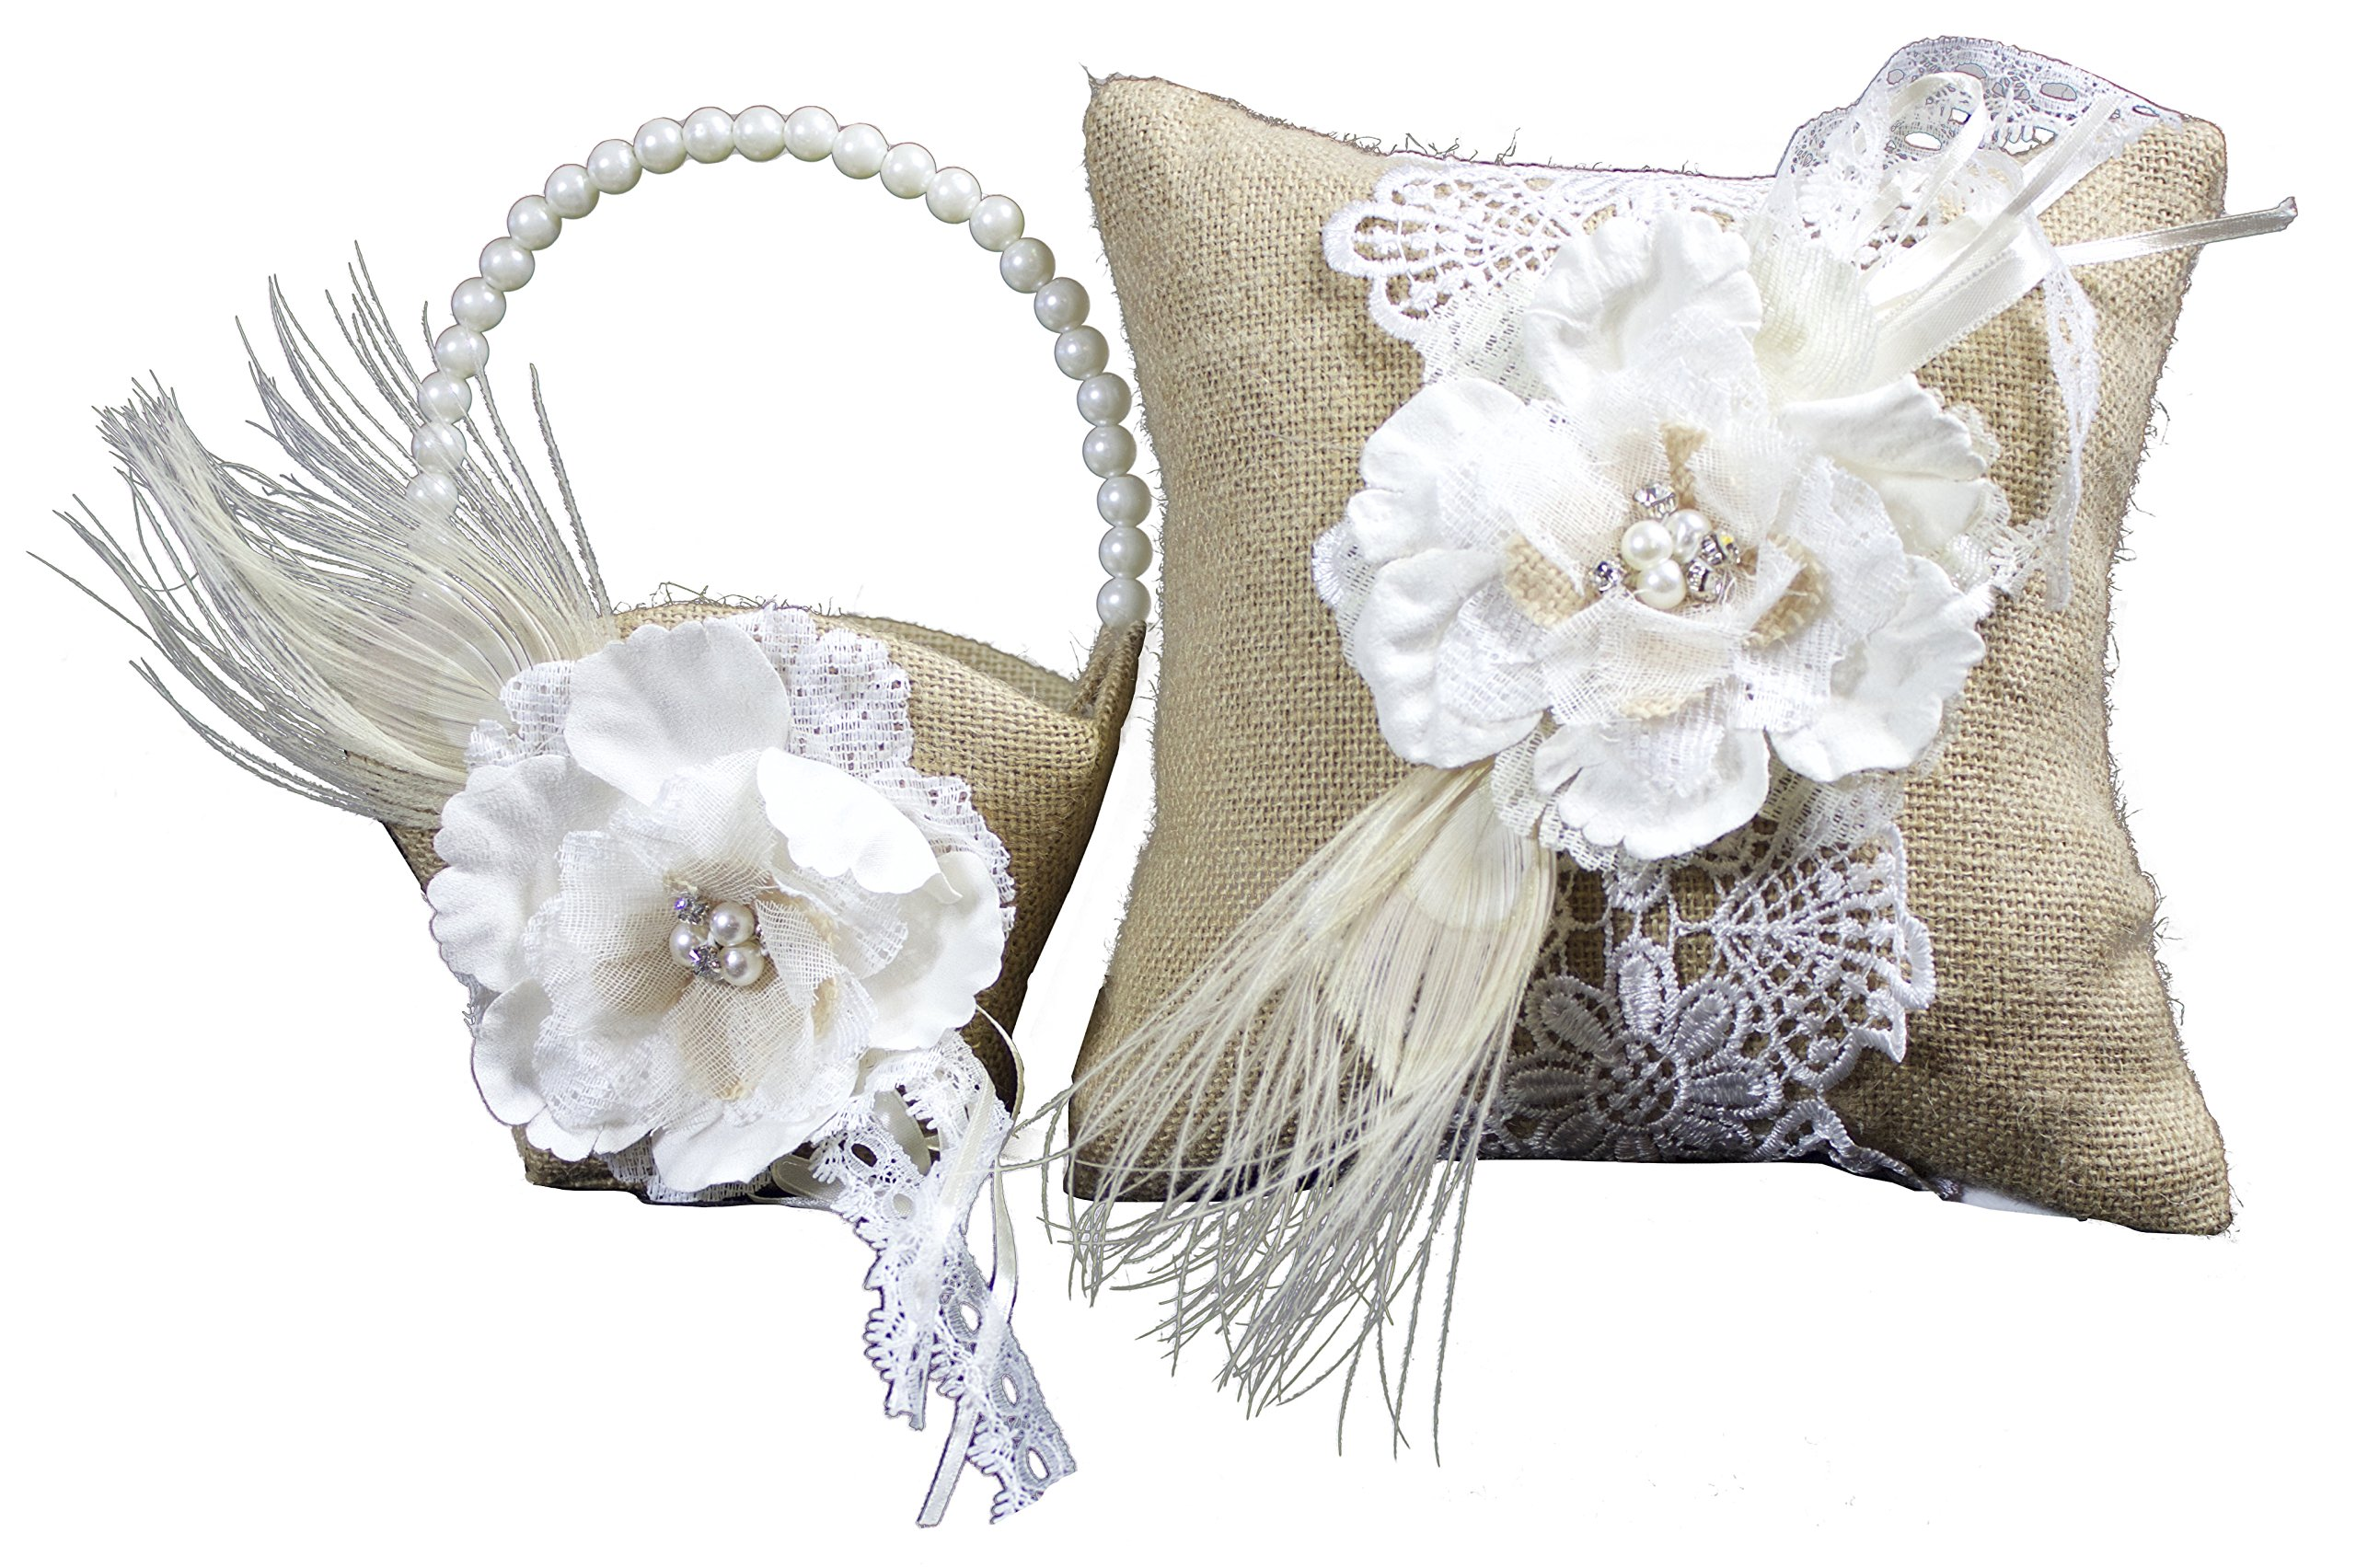 Bundle of Lillian Rose Ring Bearer Pillow and Flower Girl Basket (Burlap) by Lillian Rose